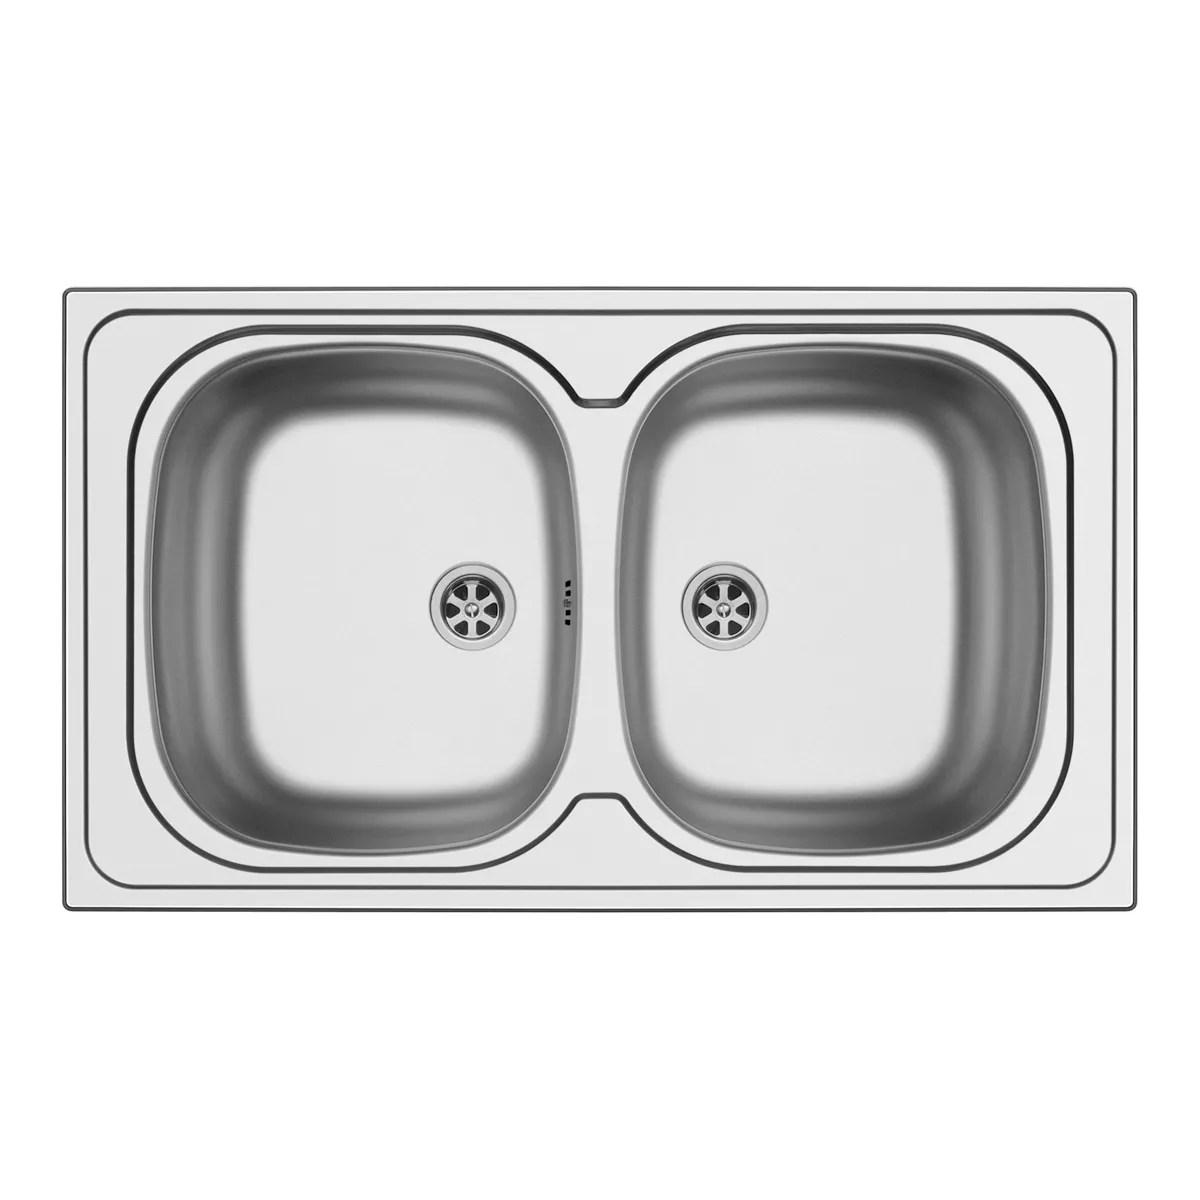 Emejing Lavello Cucina Piccolo Images  Home Interior Ideas  hollerbachus